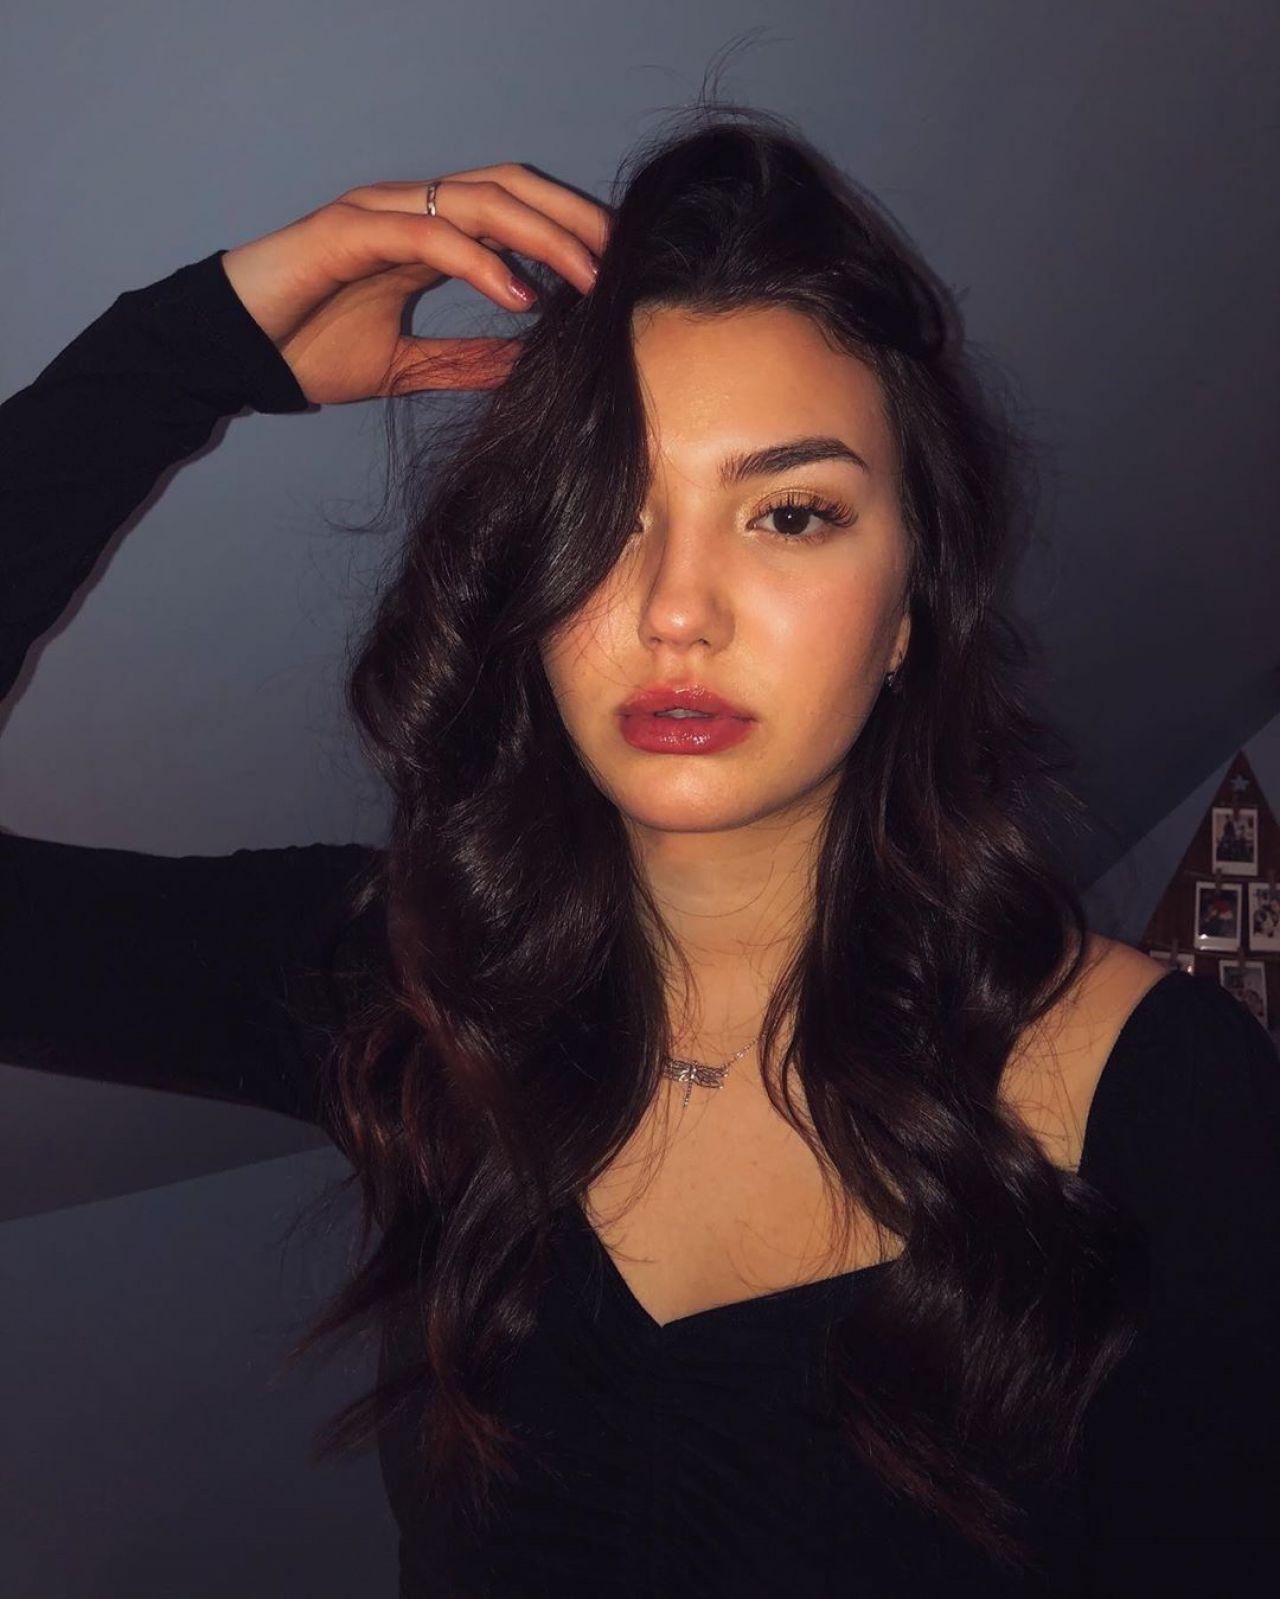 Alissa Skovbye Wiki, Bio, Age, Family, Career, Net Worth, and Social Life